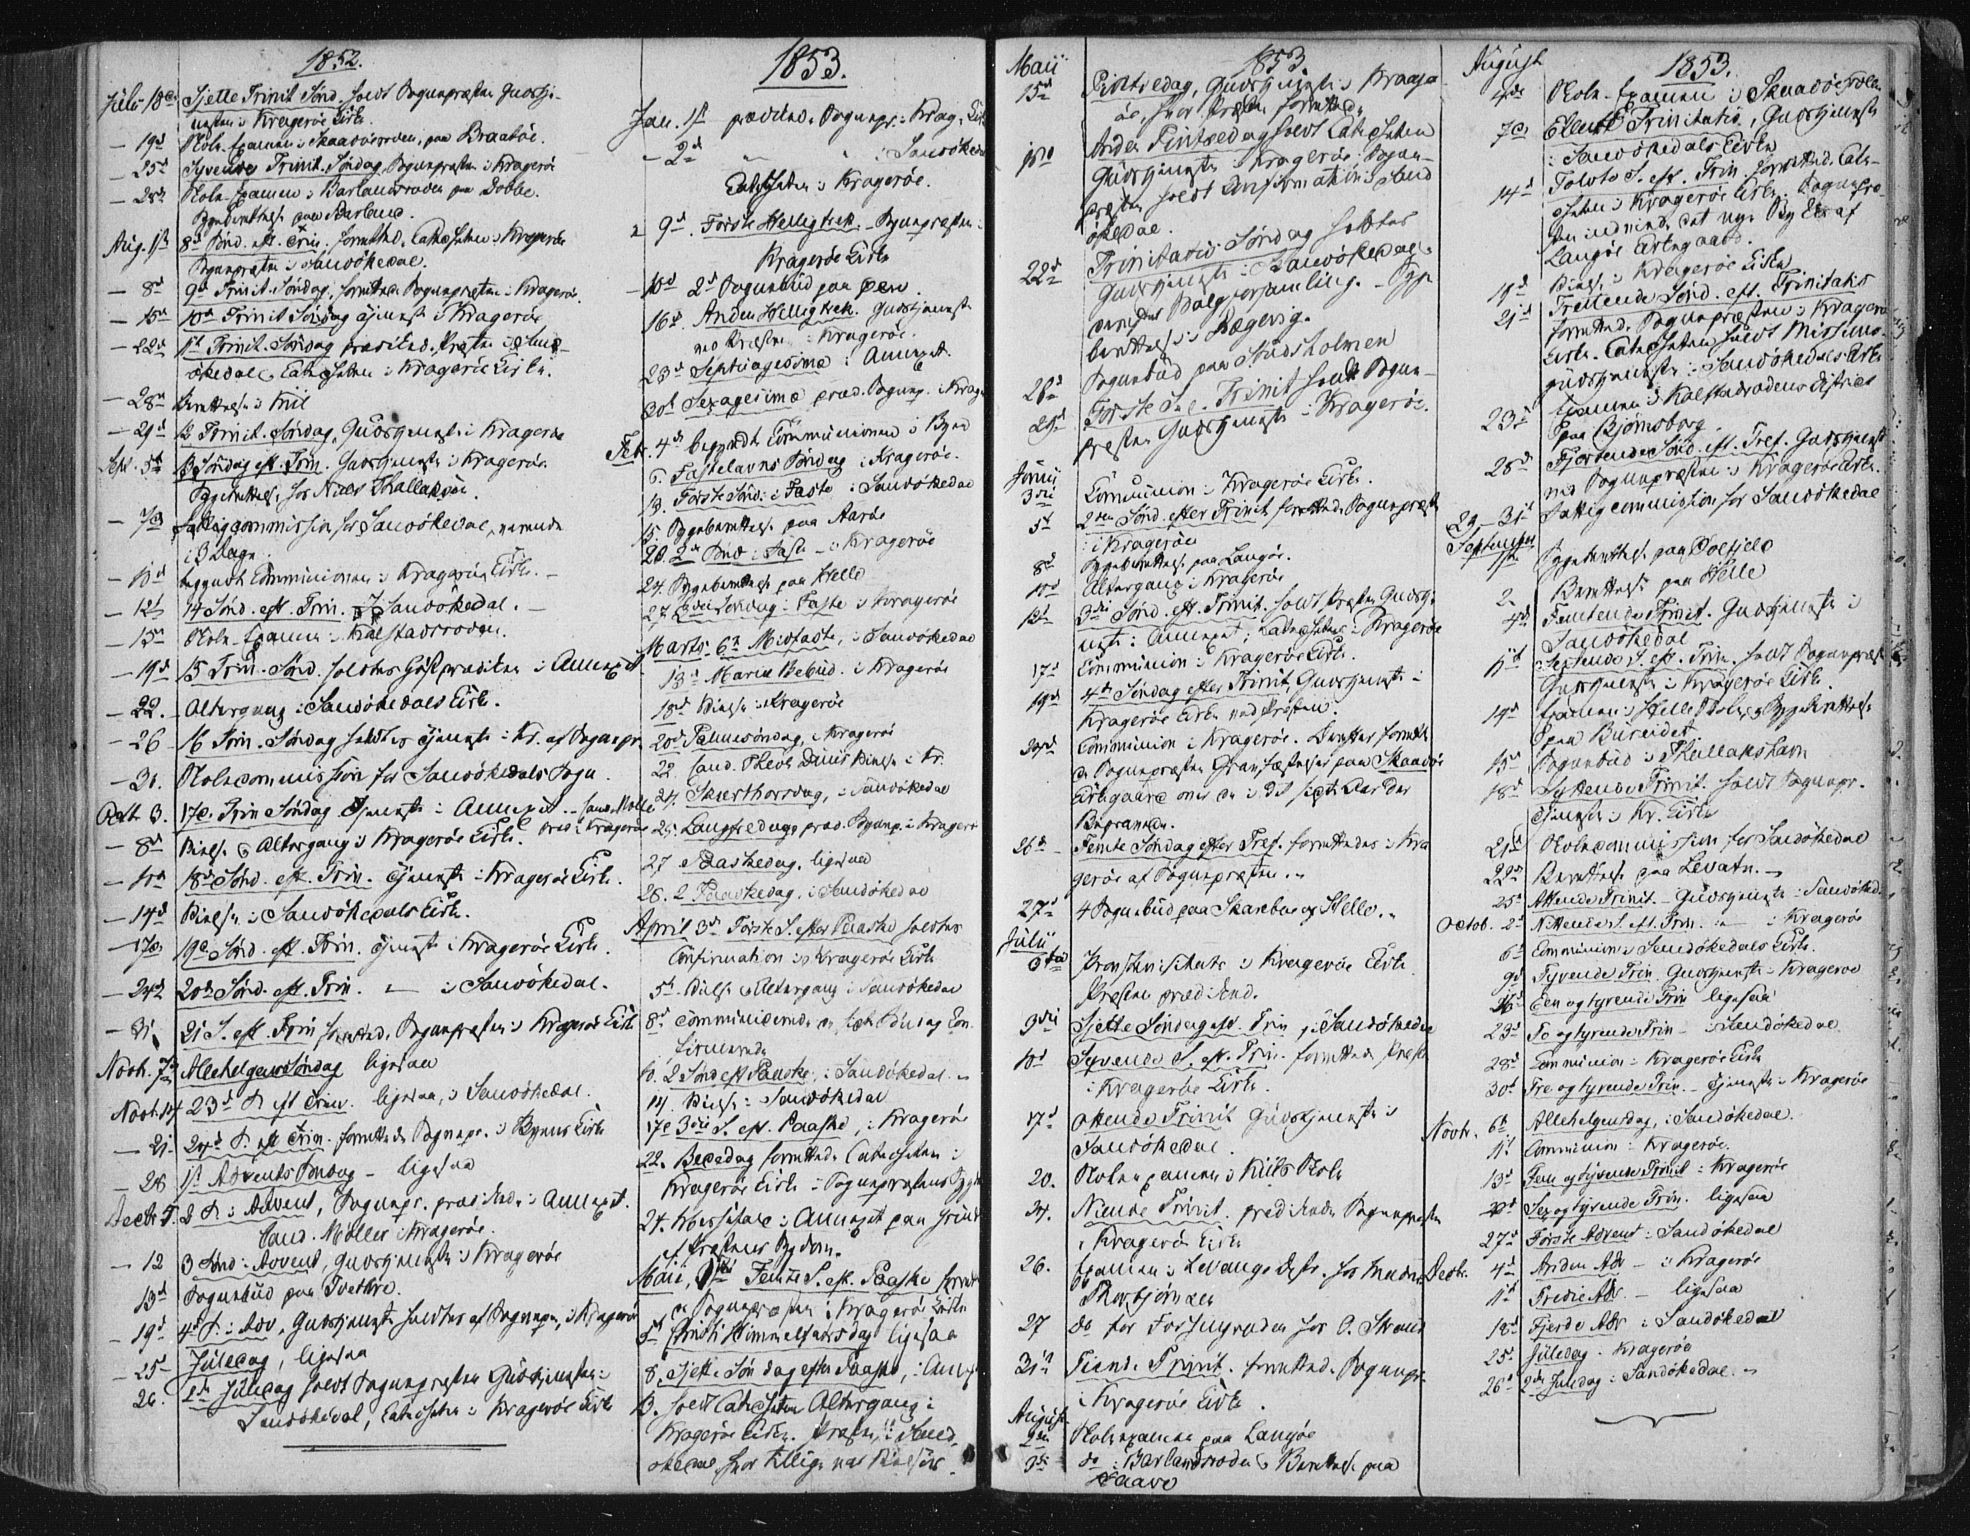 SAKO, Kragerø kirkebøker, F/Fa/L0006: Ministerialbok nr. 6, 1847-1861, s. 5